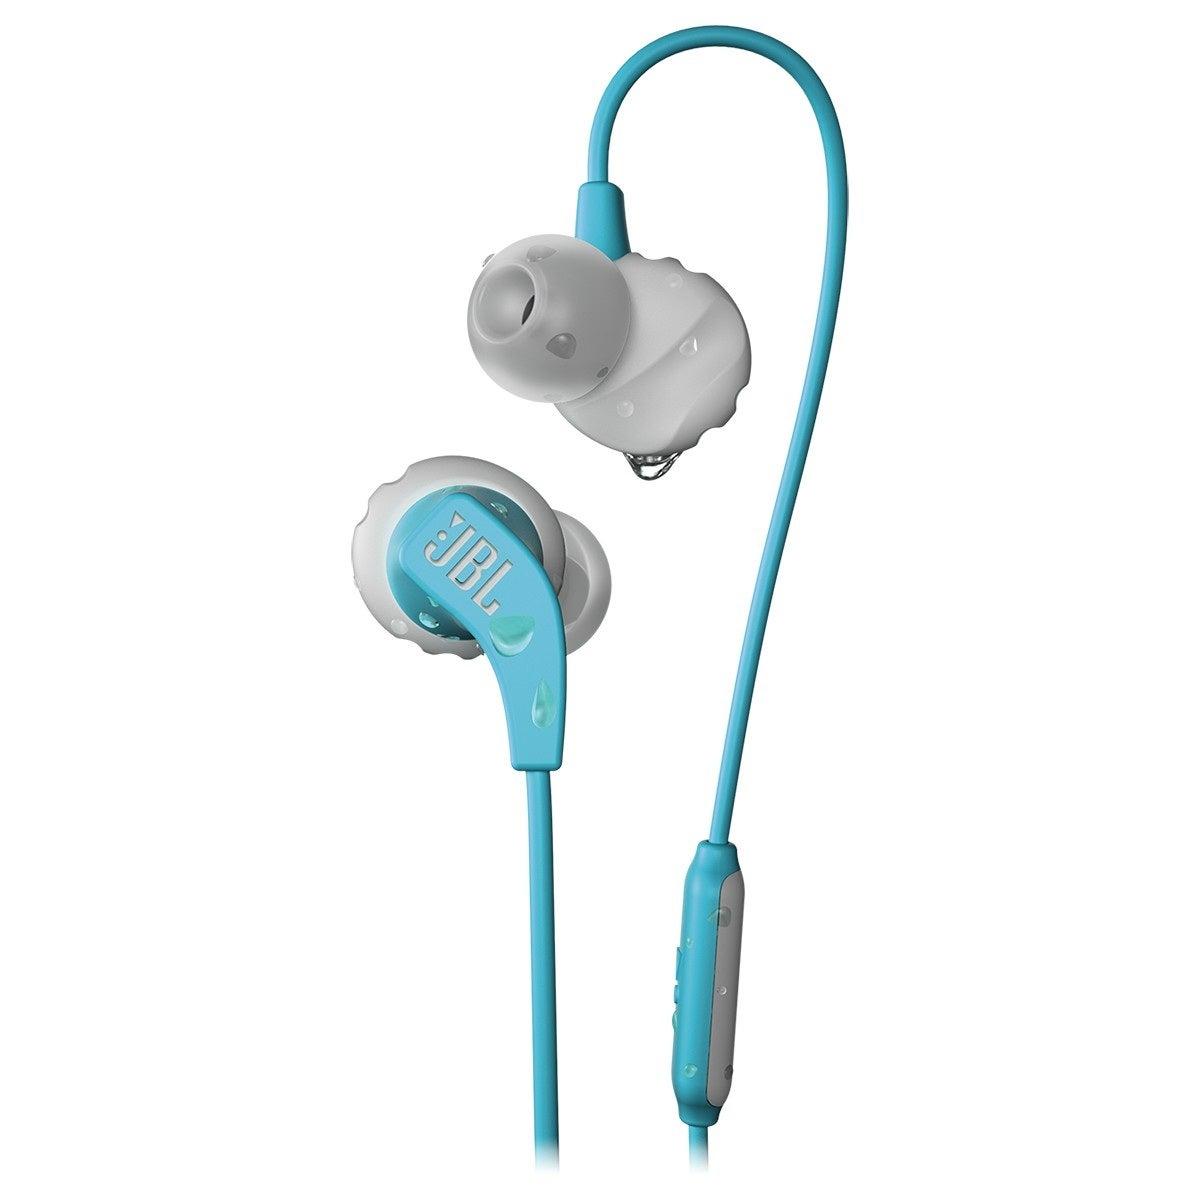 JBL Endurance RUN Wired Headphones